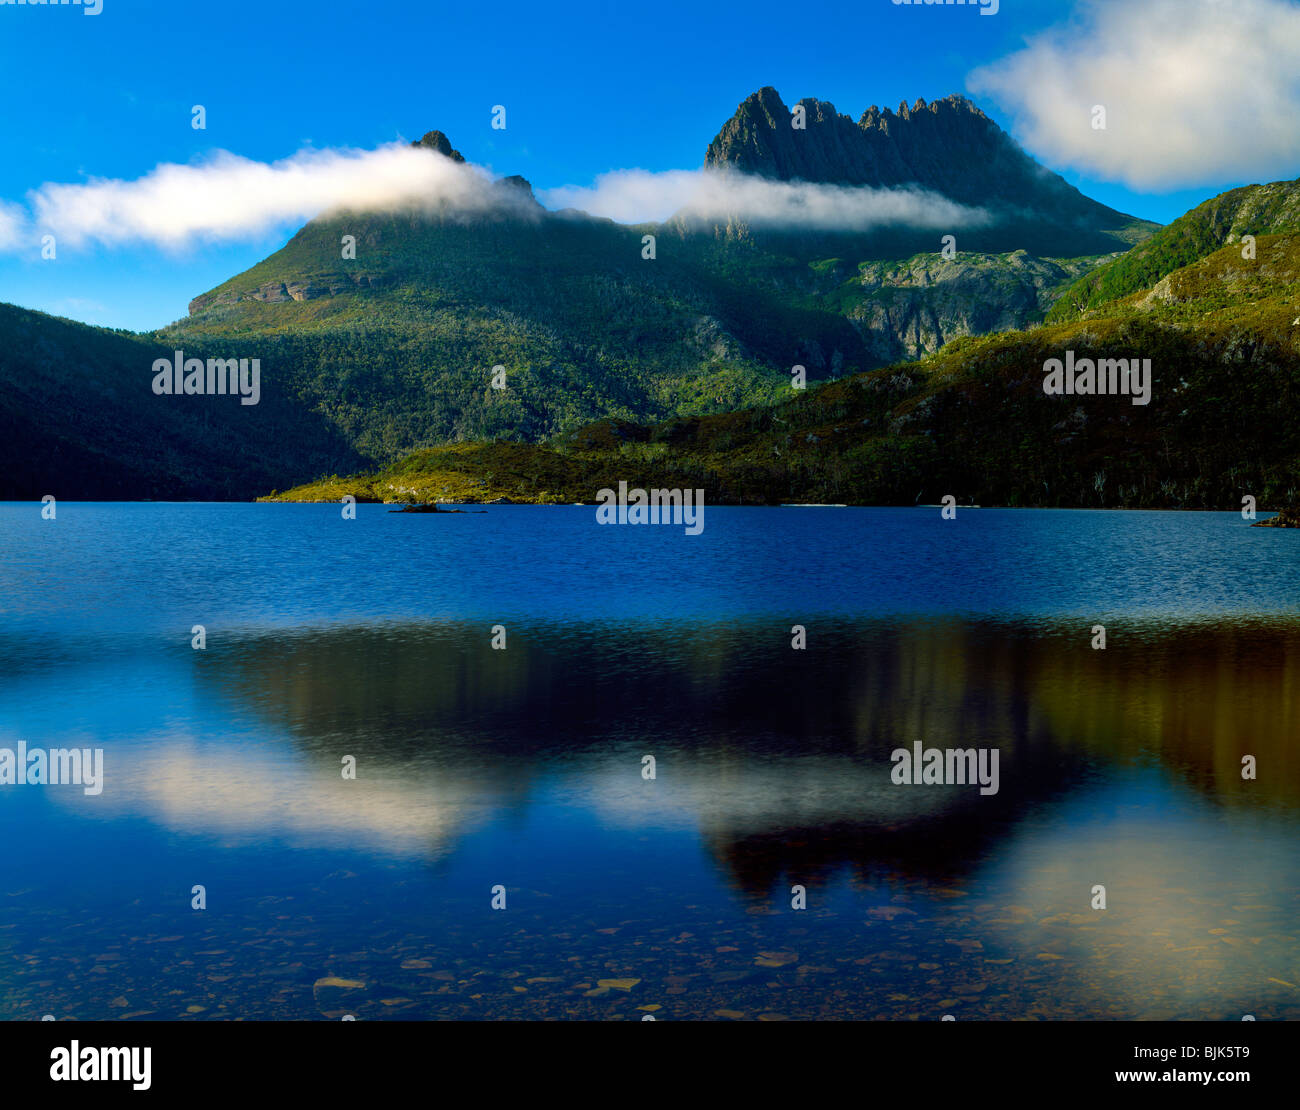 Cradle Mountain and Lake Dove, Cradle Mountain-Lake St. Clair National Park. Tasmania. Australia, Morning, 15 H - Stock Image